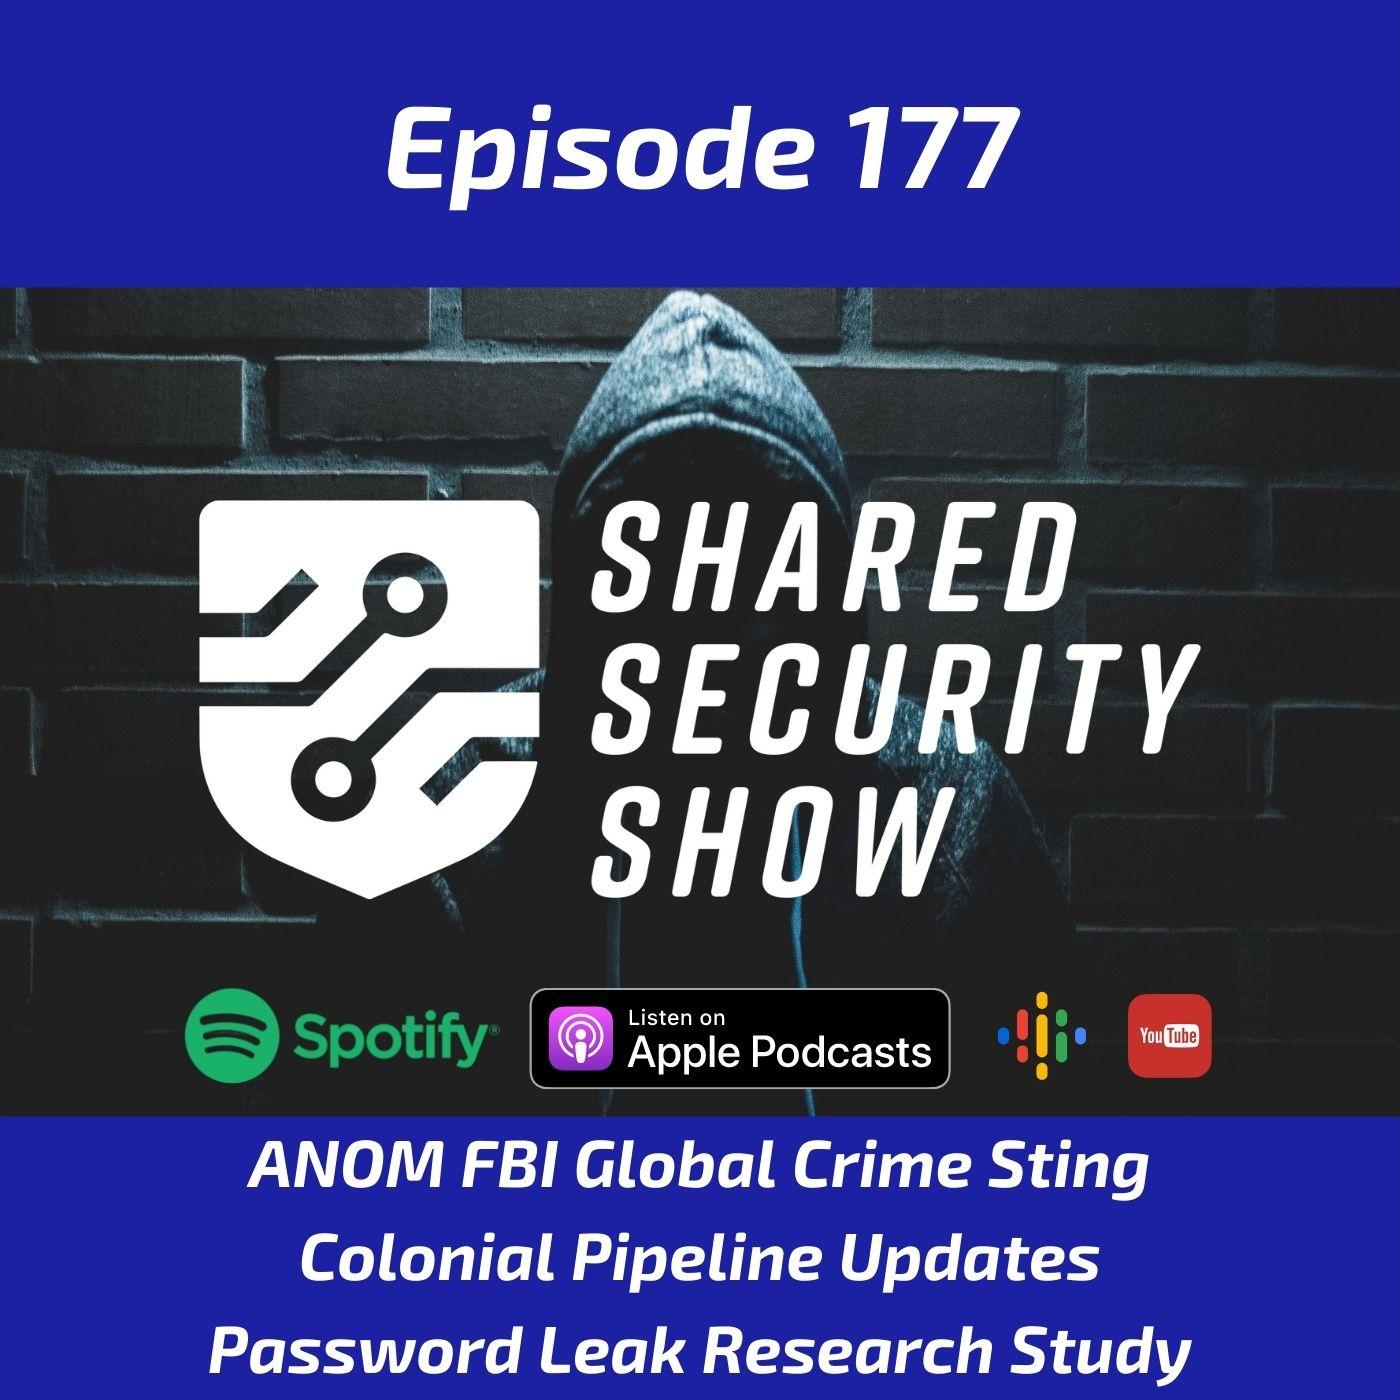 ANOM FBI Global Crime Sting, Colonial Pipeline Updates, Password Leak Research